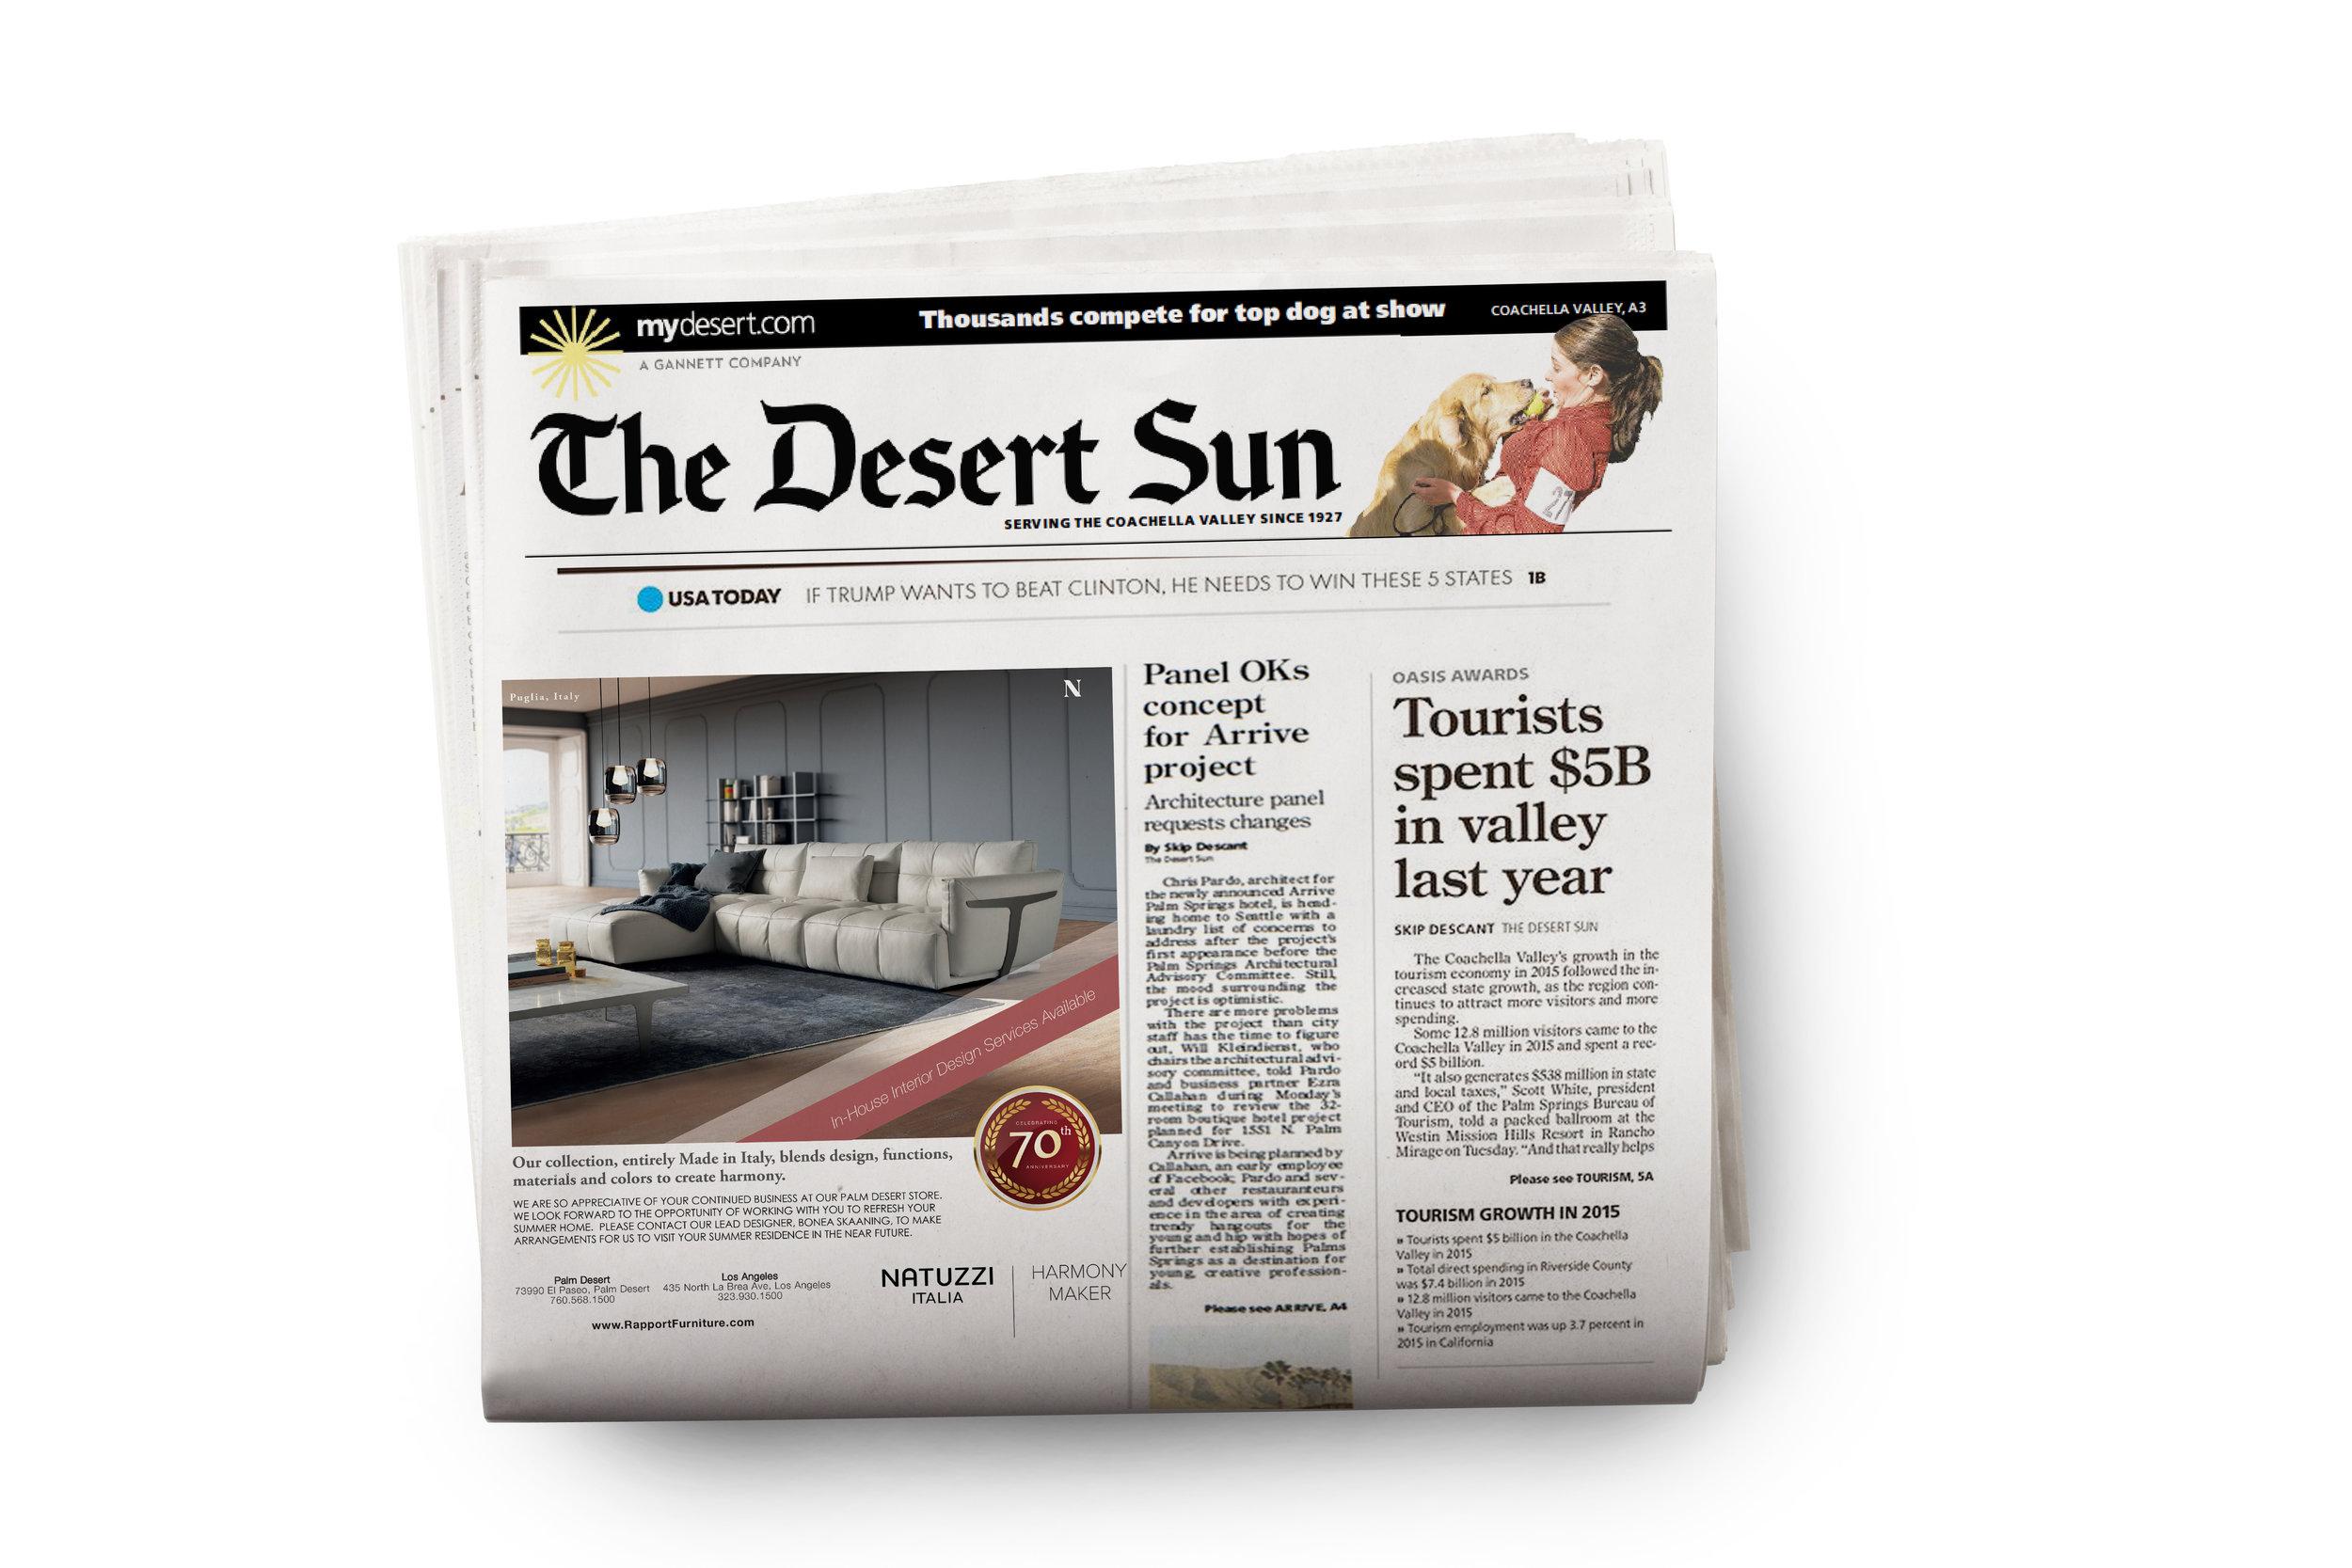 Rapport_DesertSunNewspaper_MOCKUP10.jpg